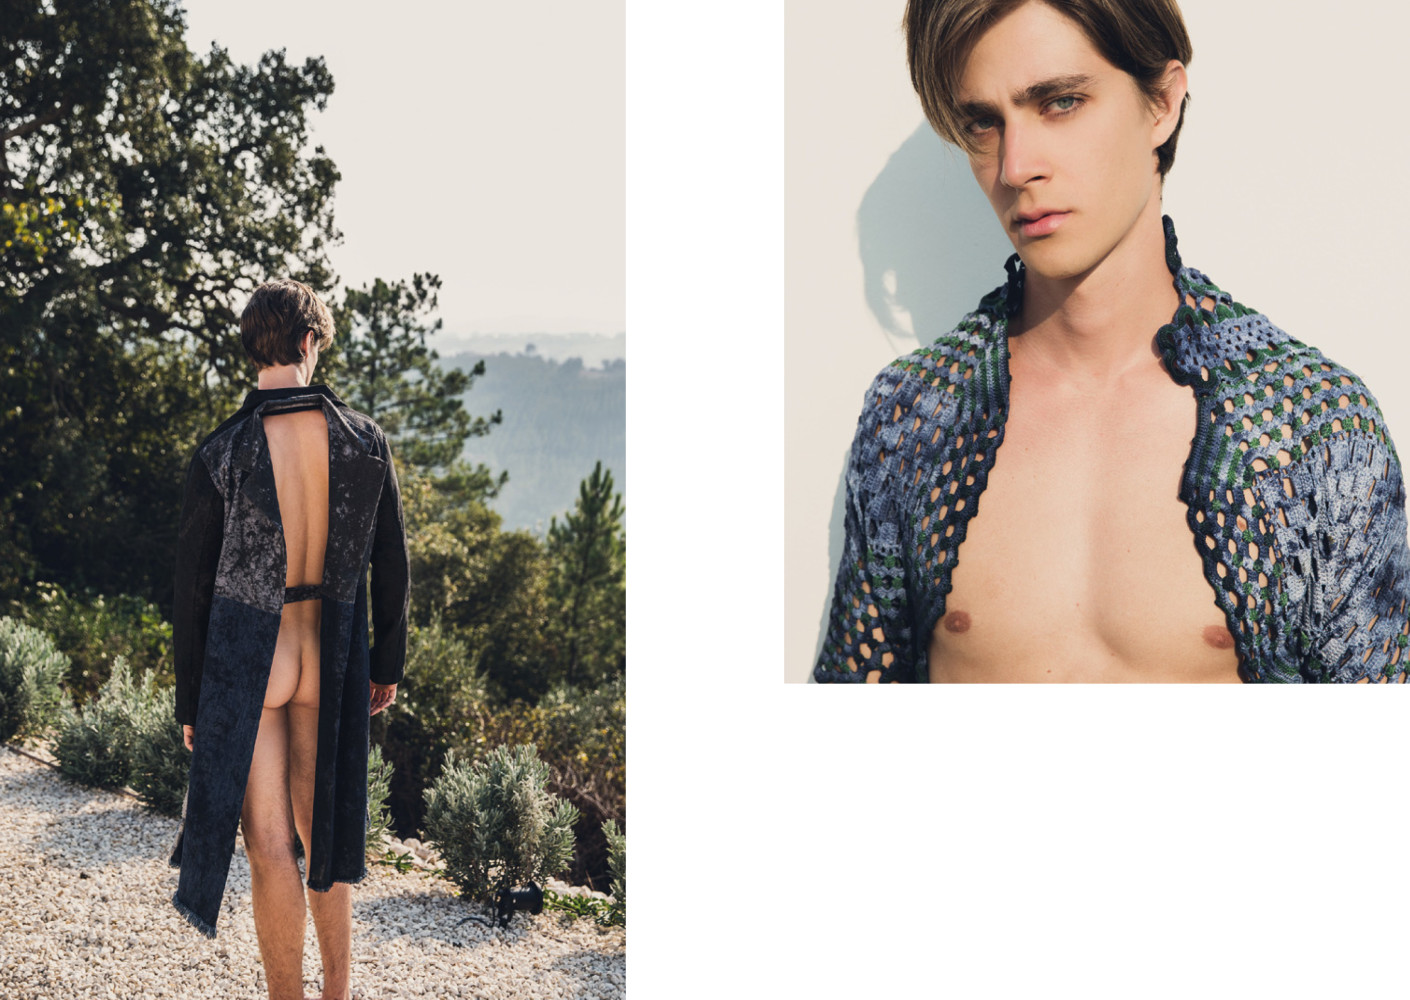 Pedro Bertolini for Glam Attitude